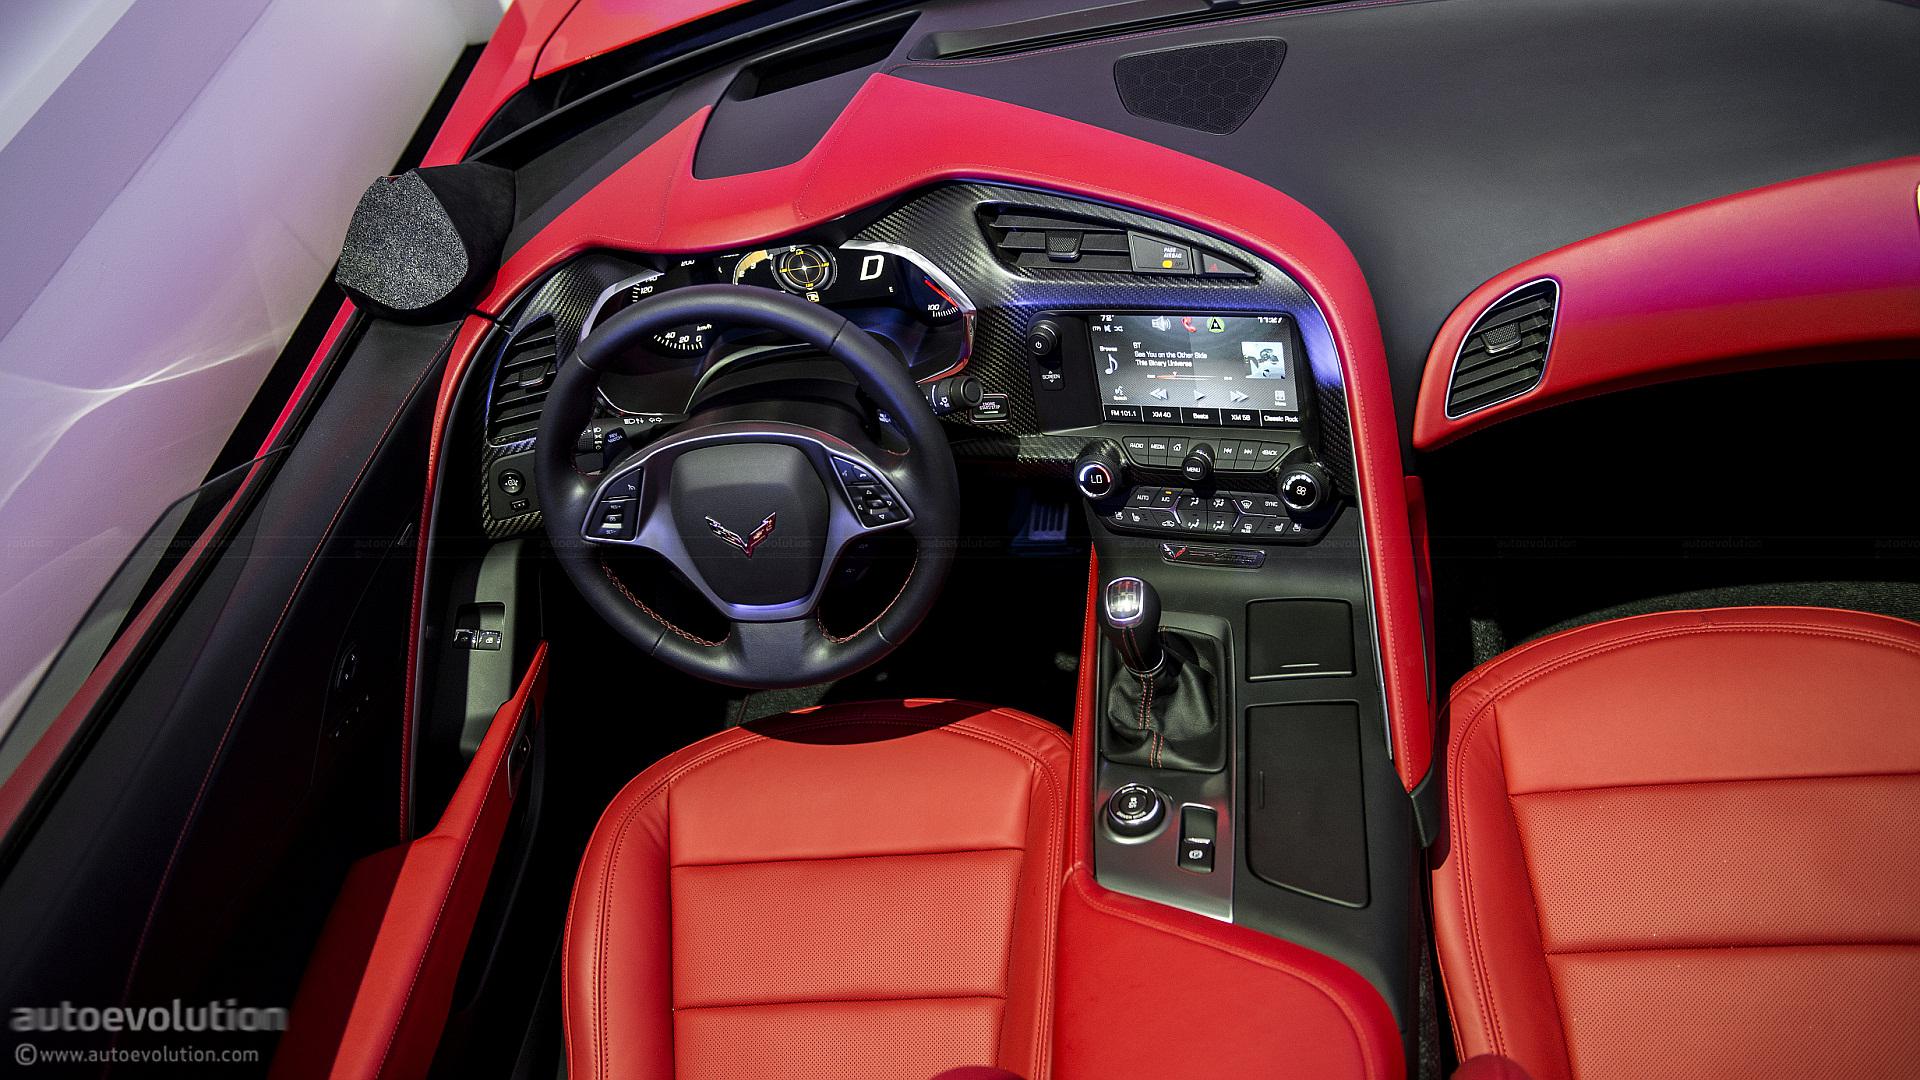 2013 naias 2014 chevrolet corvette c7 stingray in detail live - Corvette 2013 Stingray Interior